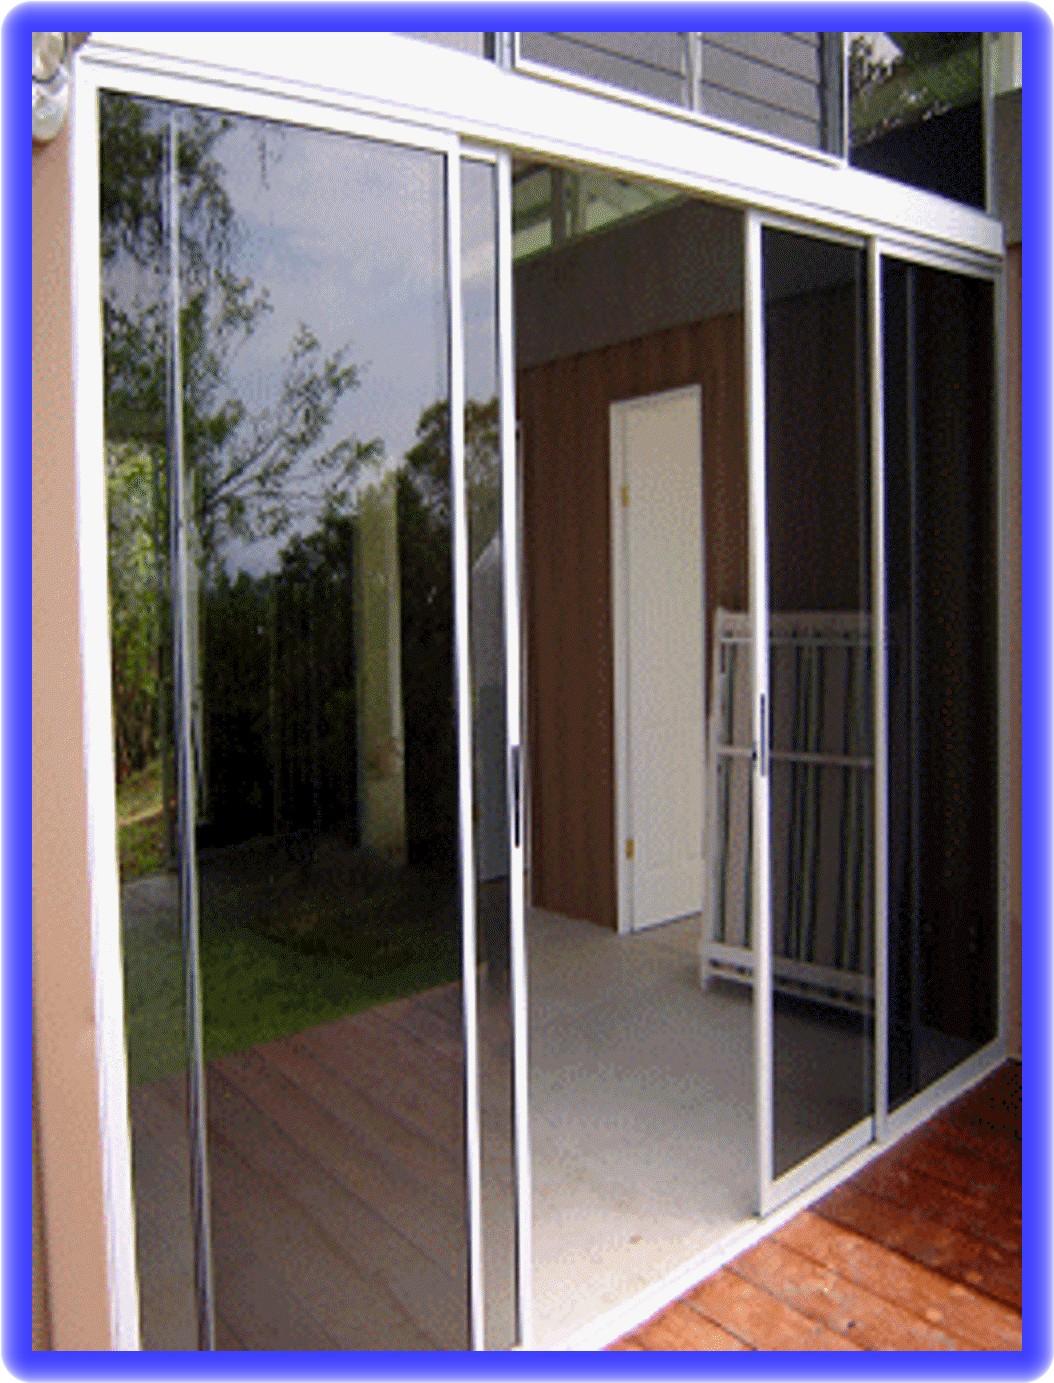 Plaza libre set 3 puertas corredizas de balcon en for Puertas jardin aluminio